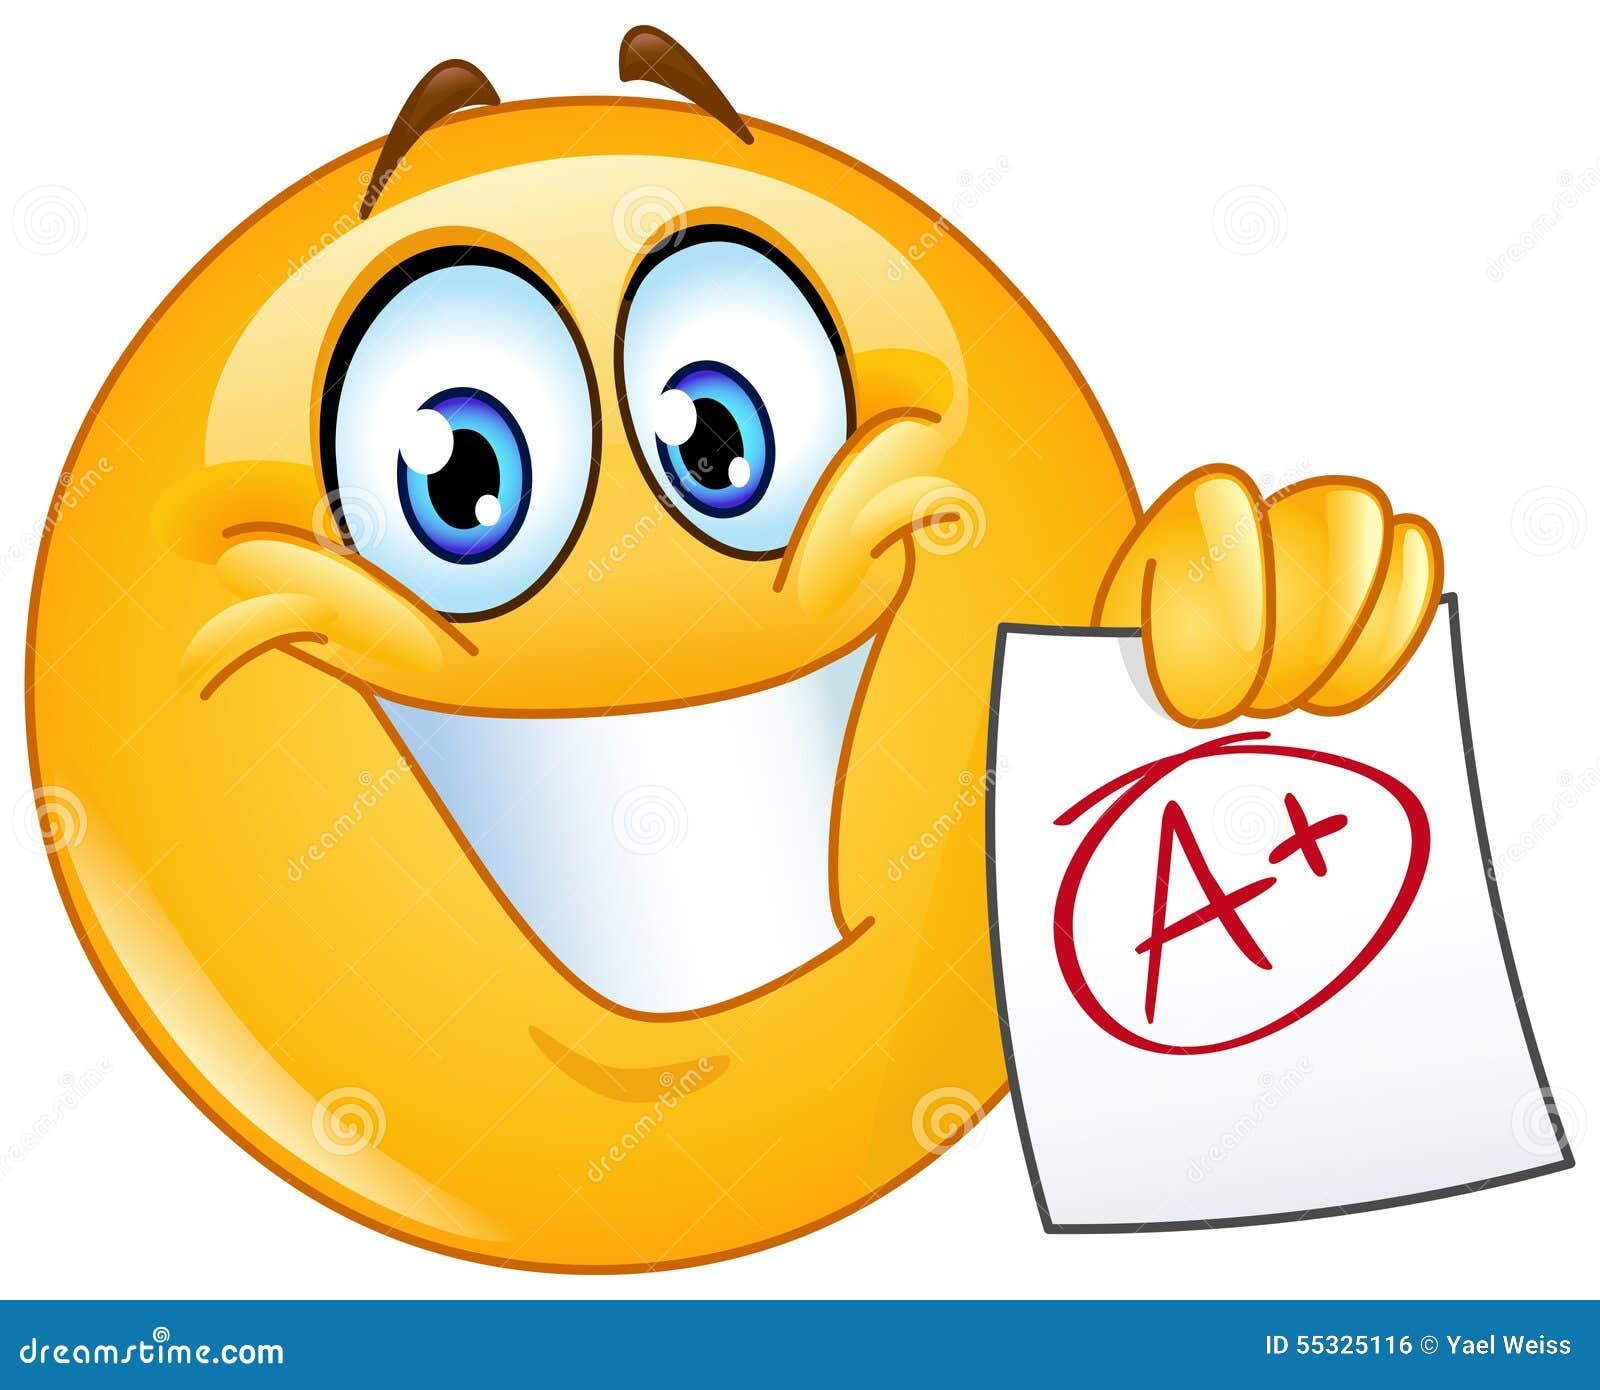 A Plus Grade Emoticon Stock Vector - Image: 55325116 Happy High School Student Clipart